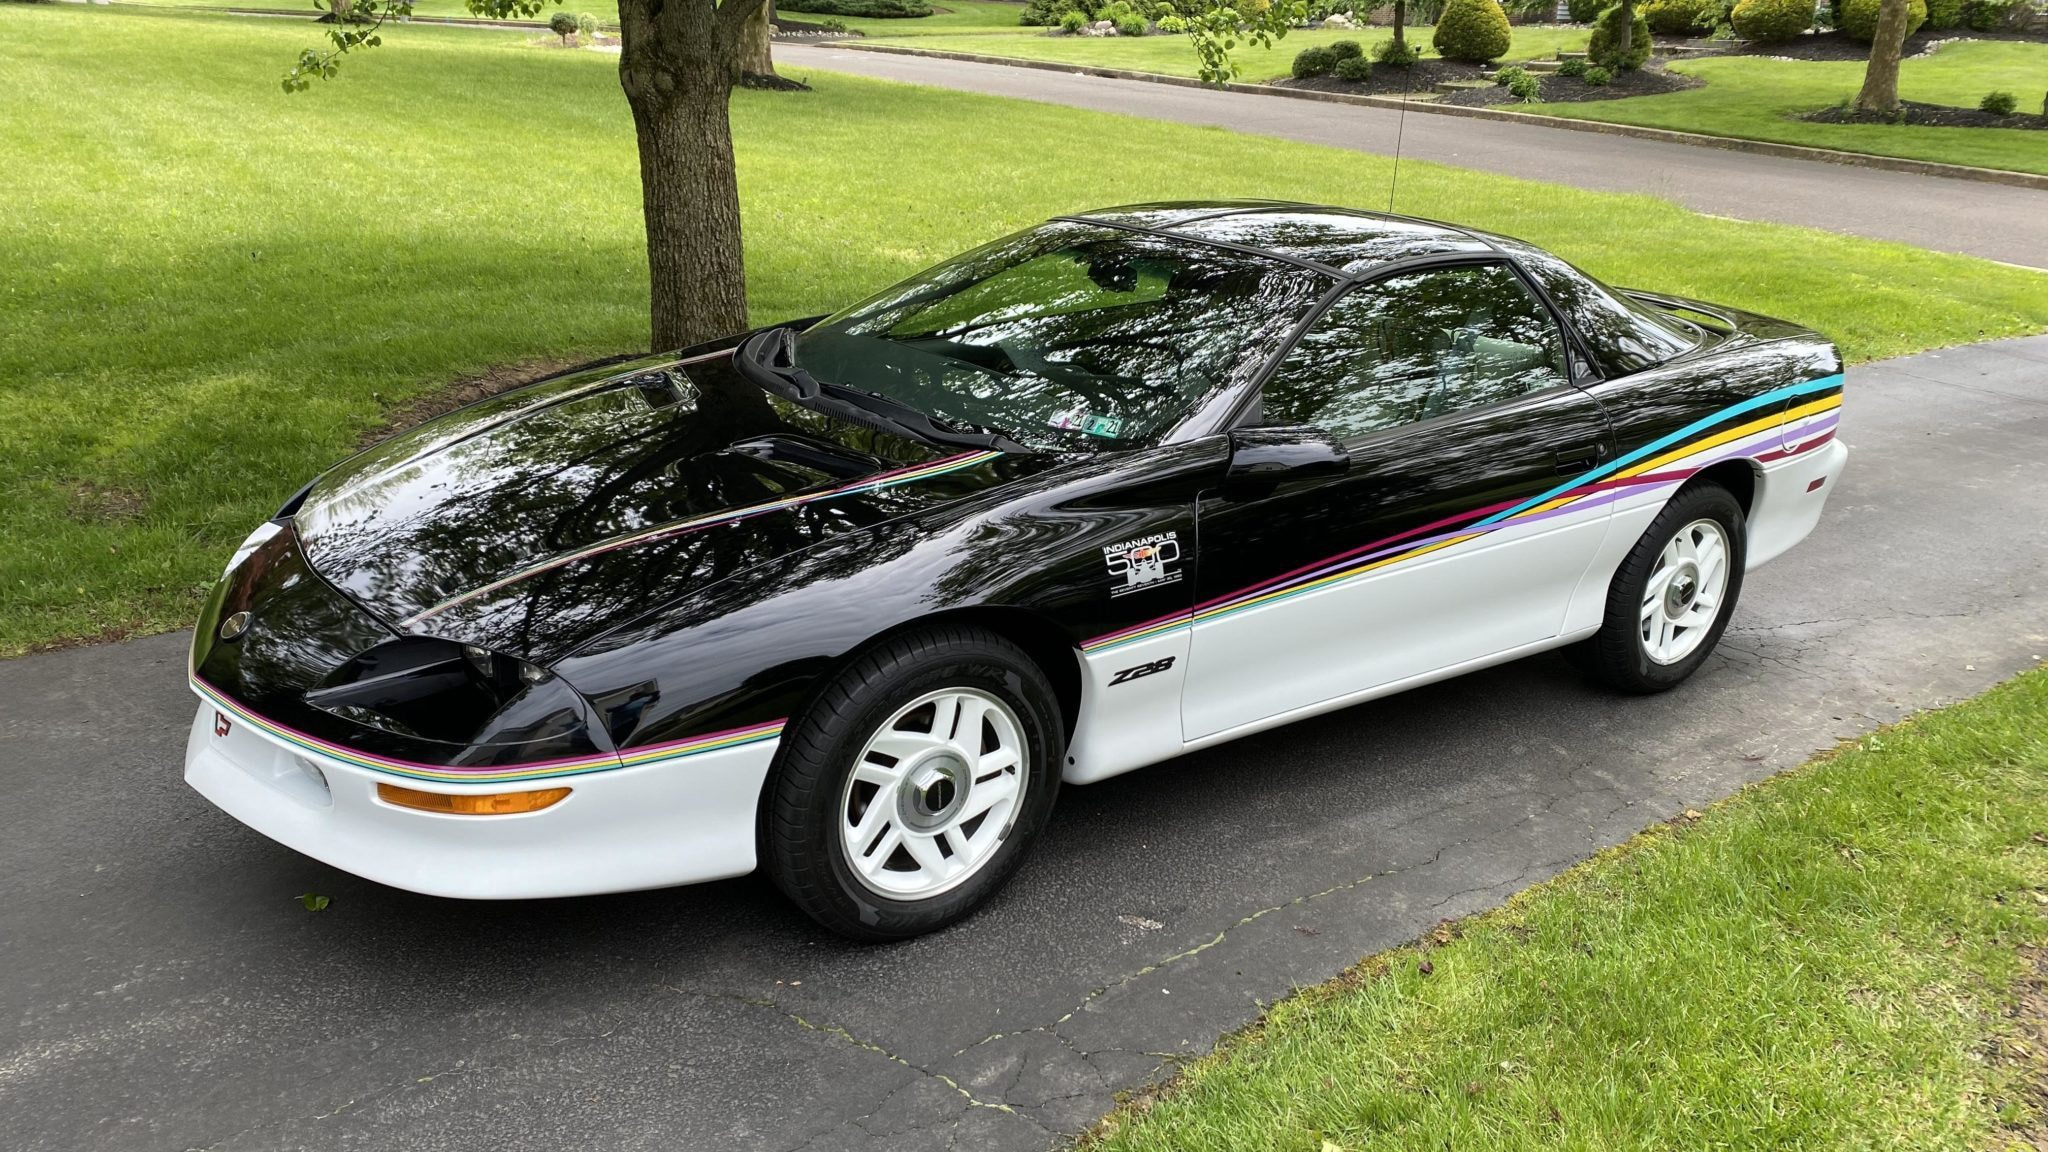 1993 Chevy Camaro Indy 500 Replica Perfectly Encapsulates the 1990s